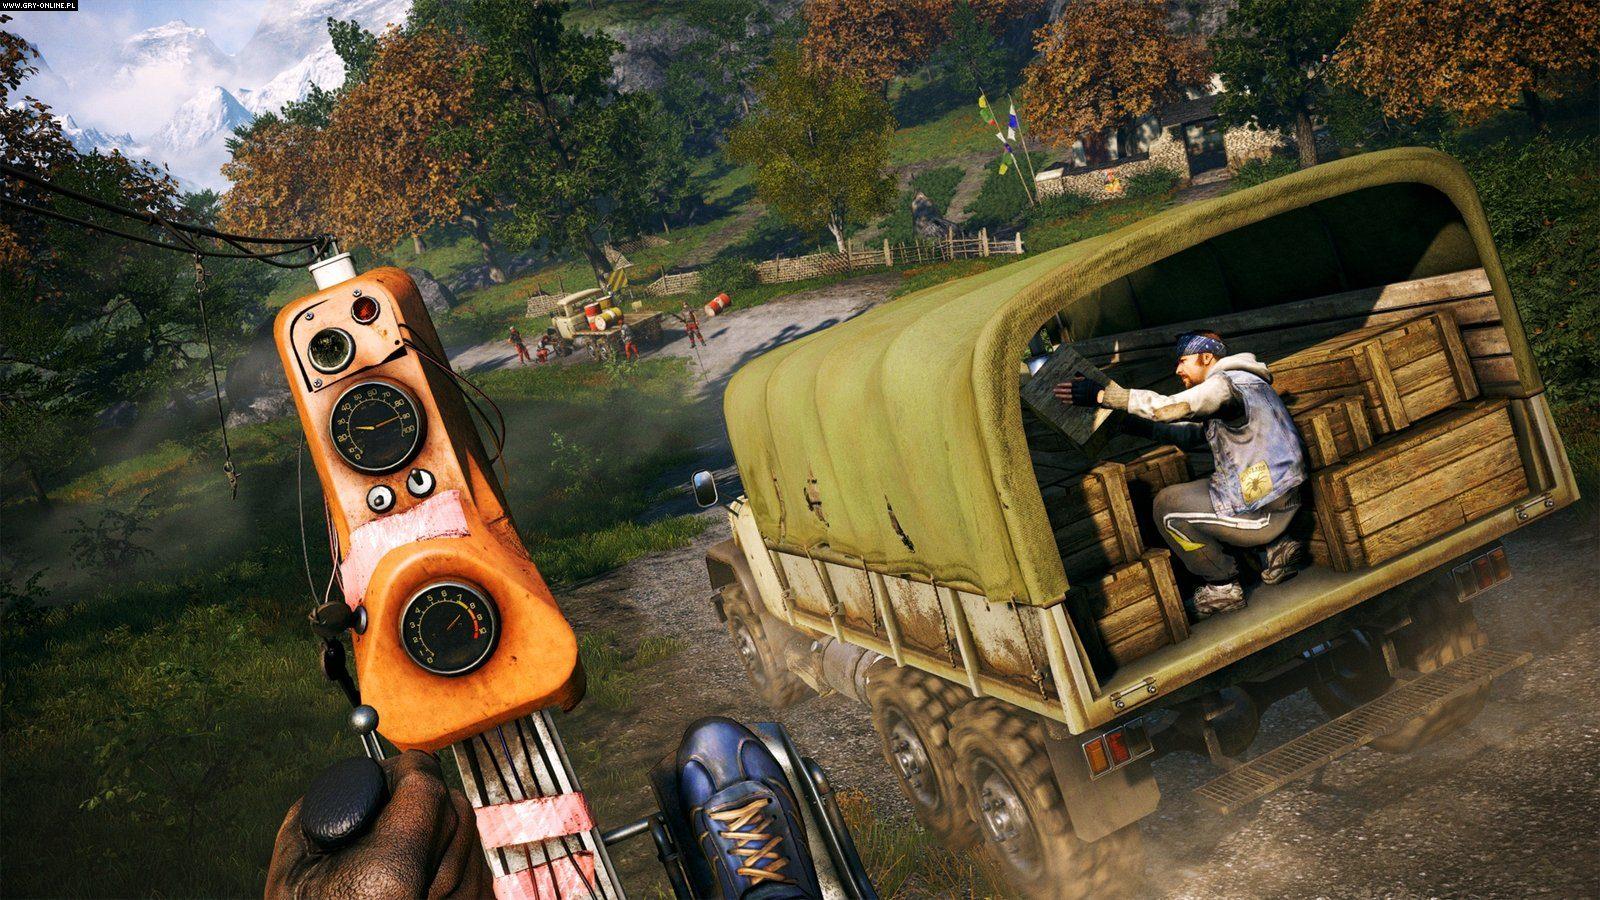 Far Cry 4 image #1